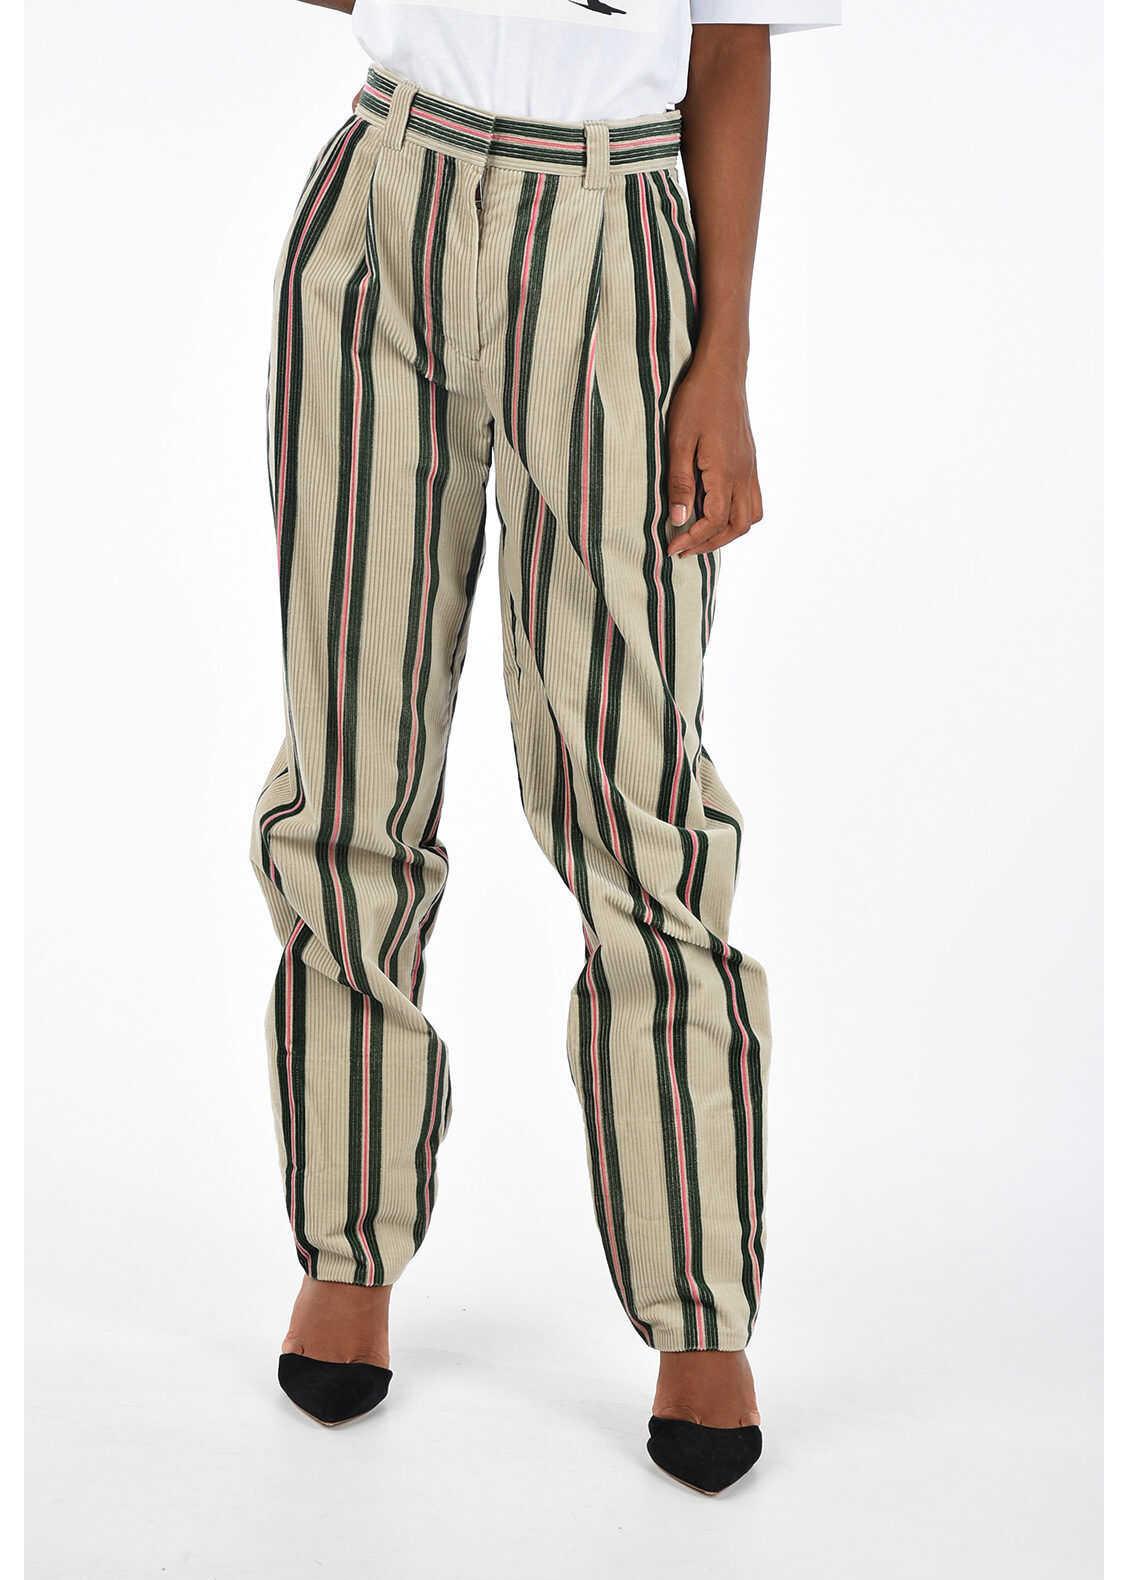 Burberry Velvet Striped Pants MULTICOLOR